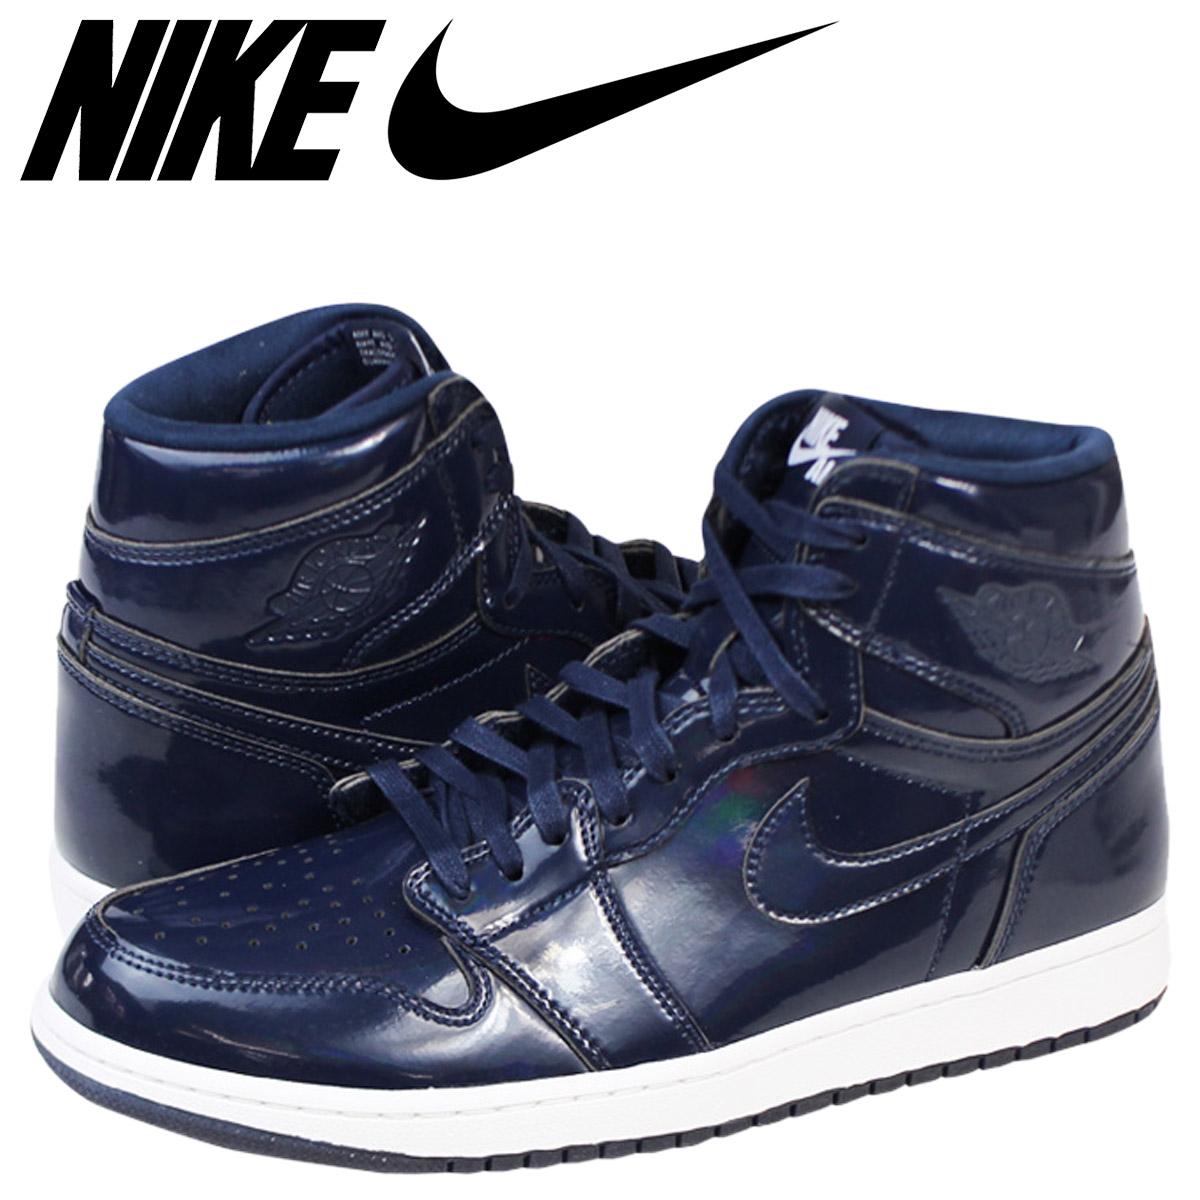 NIKE Nike Air Jordan sneakers AIR JORDAN 1 RETRO HI OG DSM Air Jordan 1 nostalgic high Dover street market 789,747 401 navy men